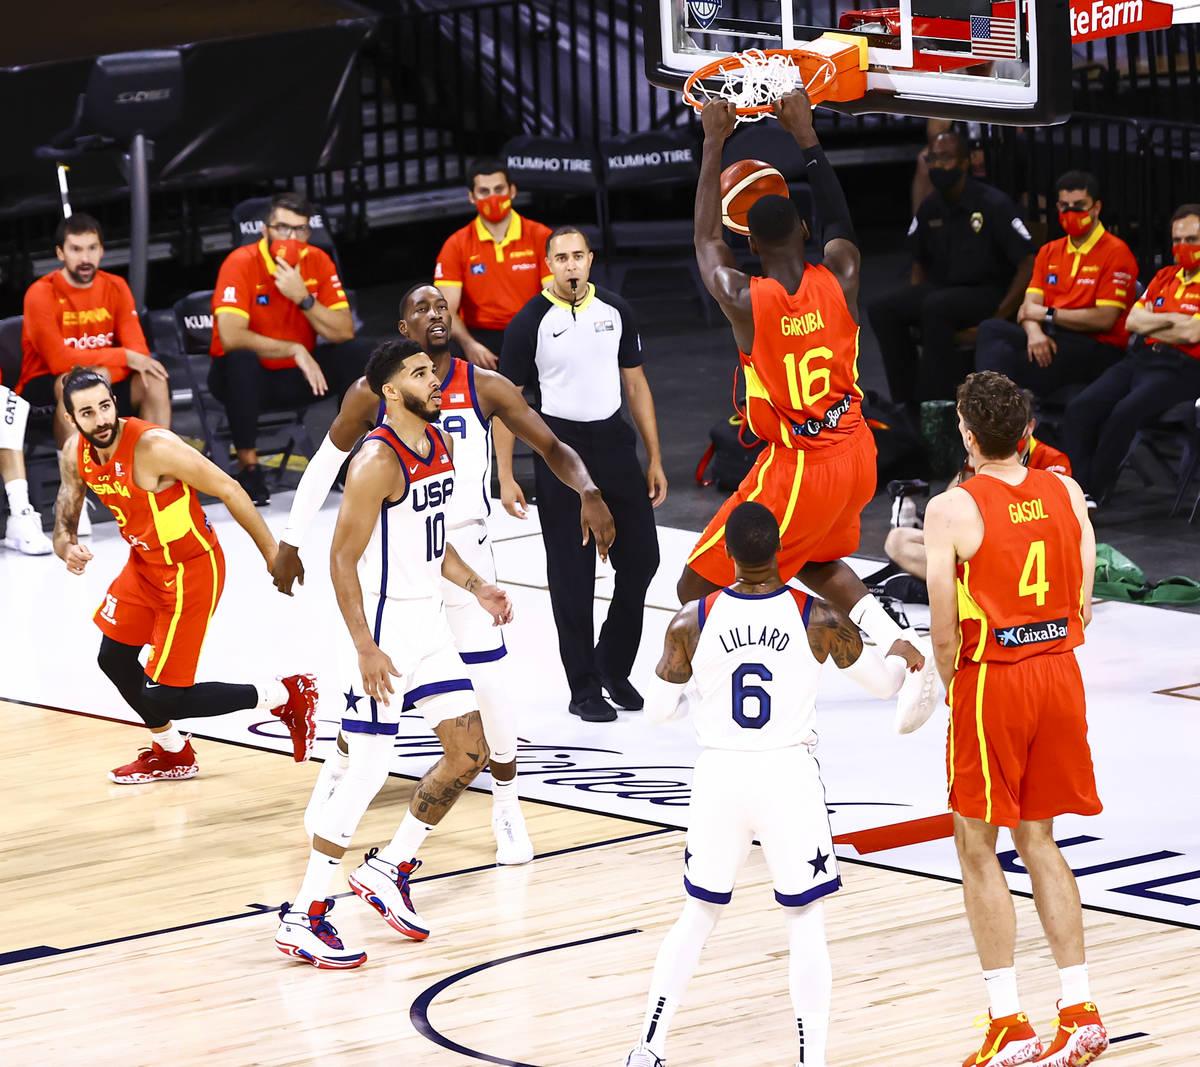 Spain power forward Usman Garuba (16) dunks the ball against the United States during the first ...